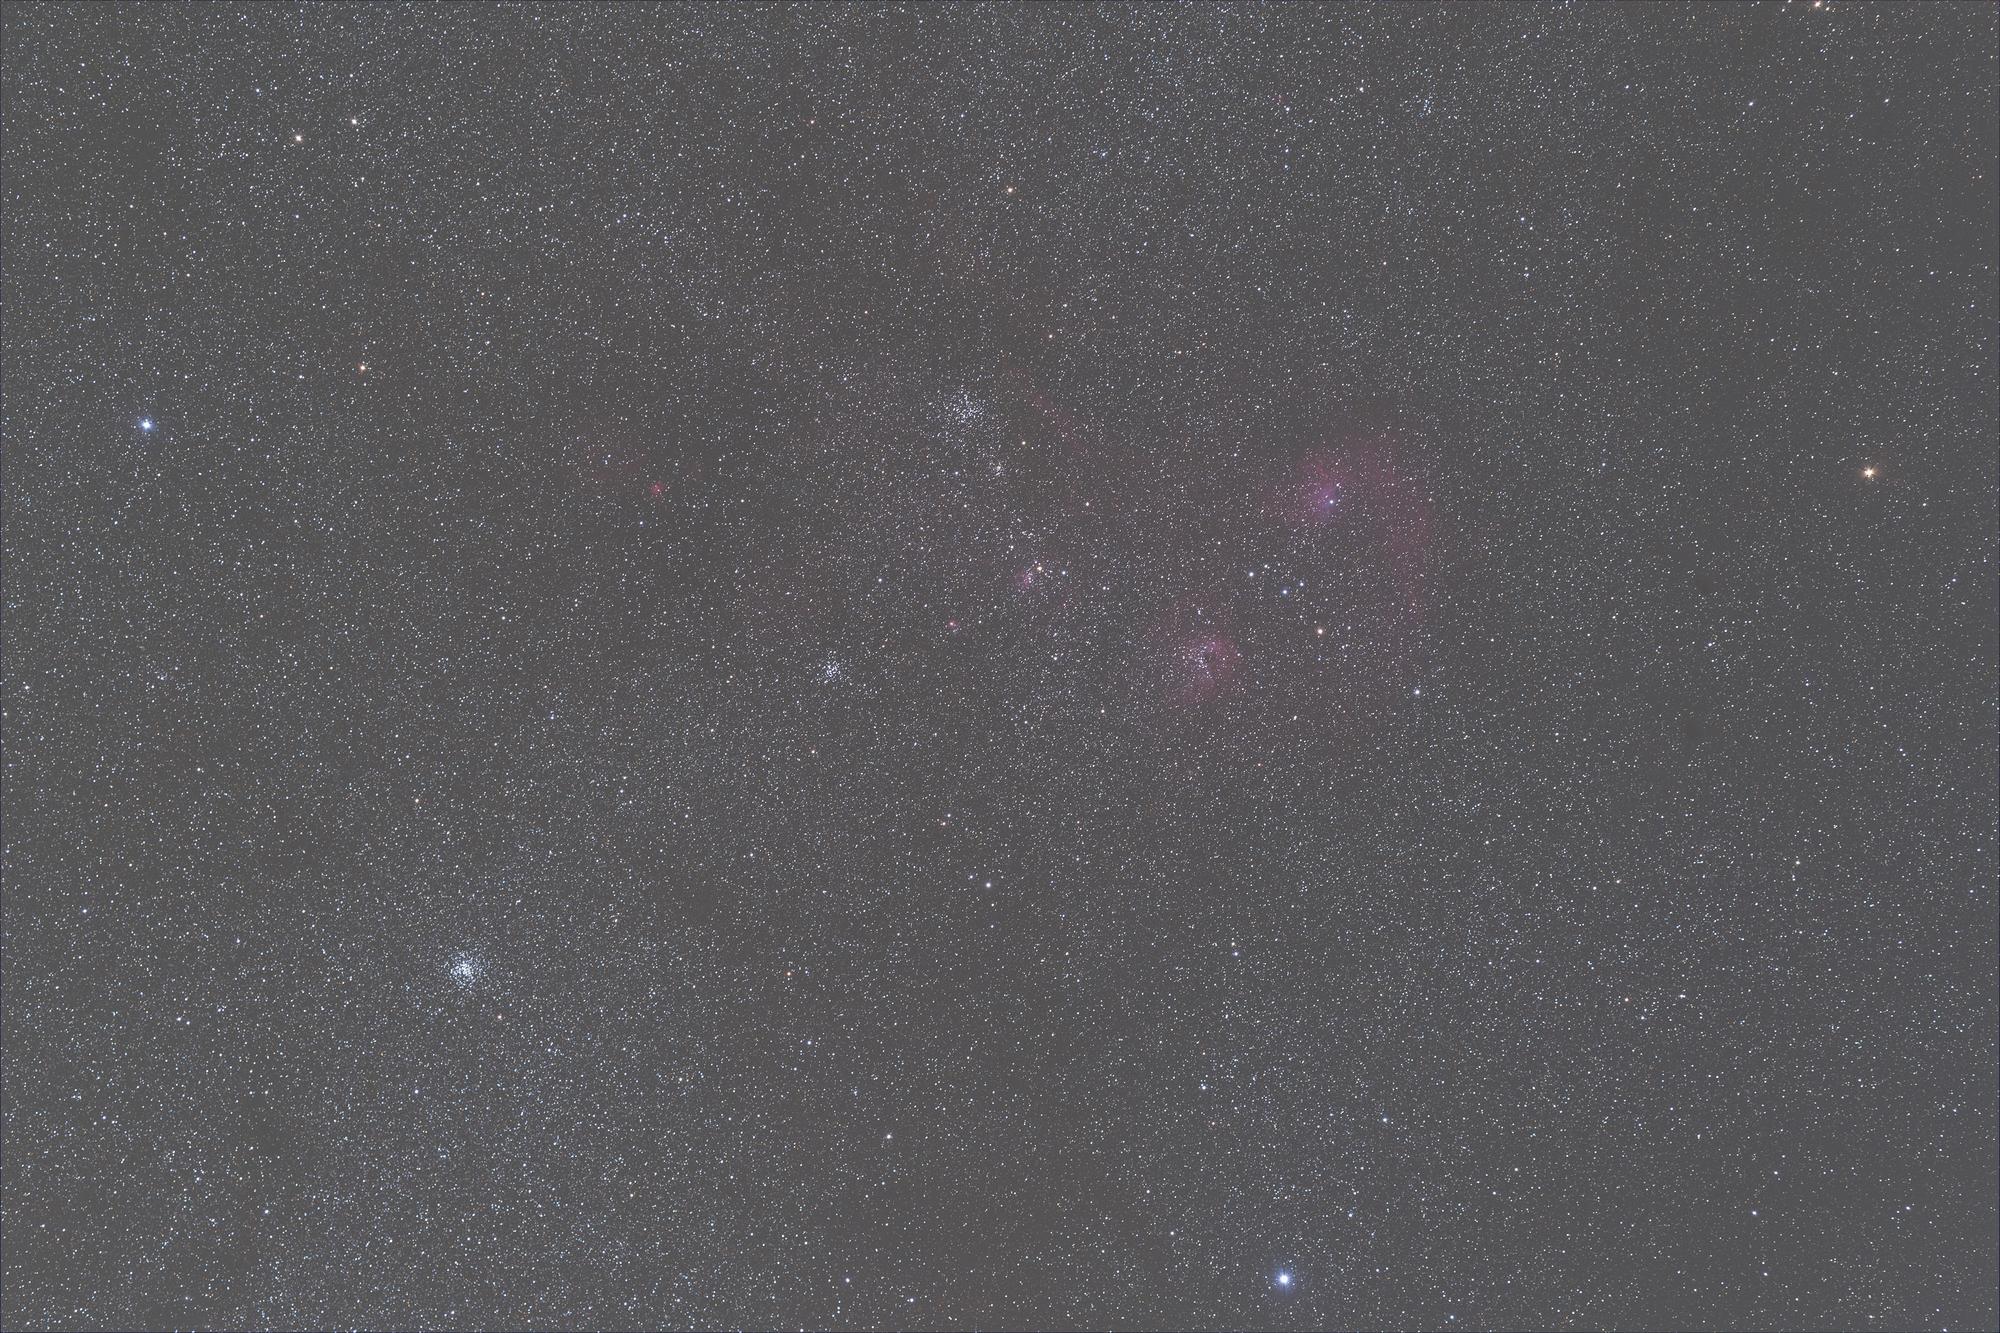 f:id:snct-astro:20201014211102j:plain